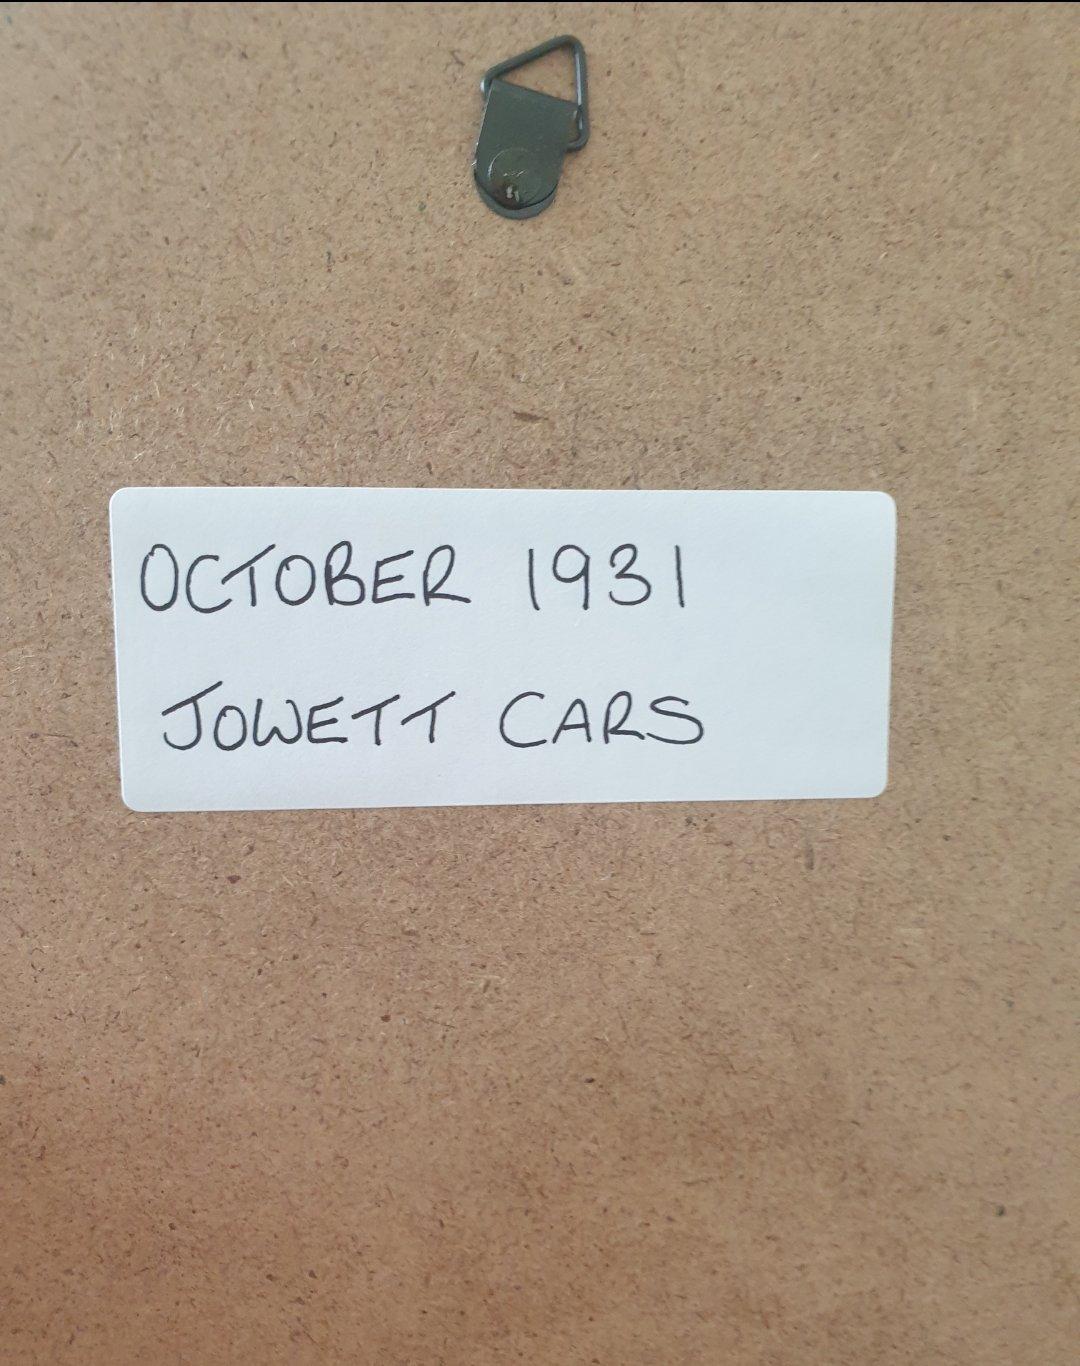 1977 Original 1931 Jowett Framed Advert For Sale (picture 2 of 3)